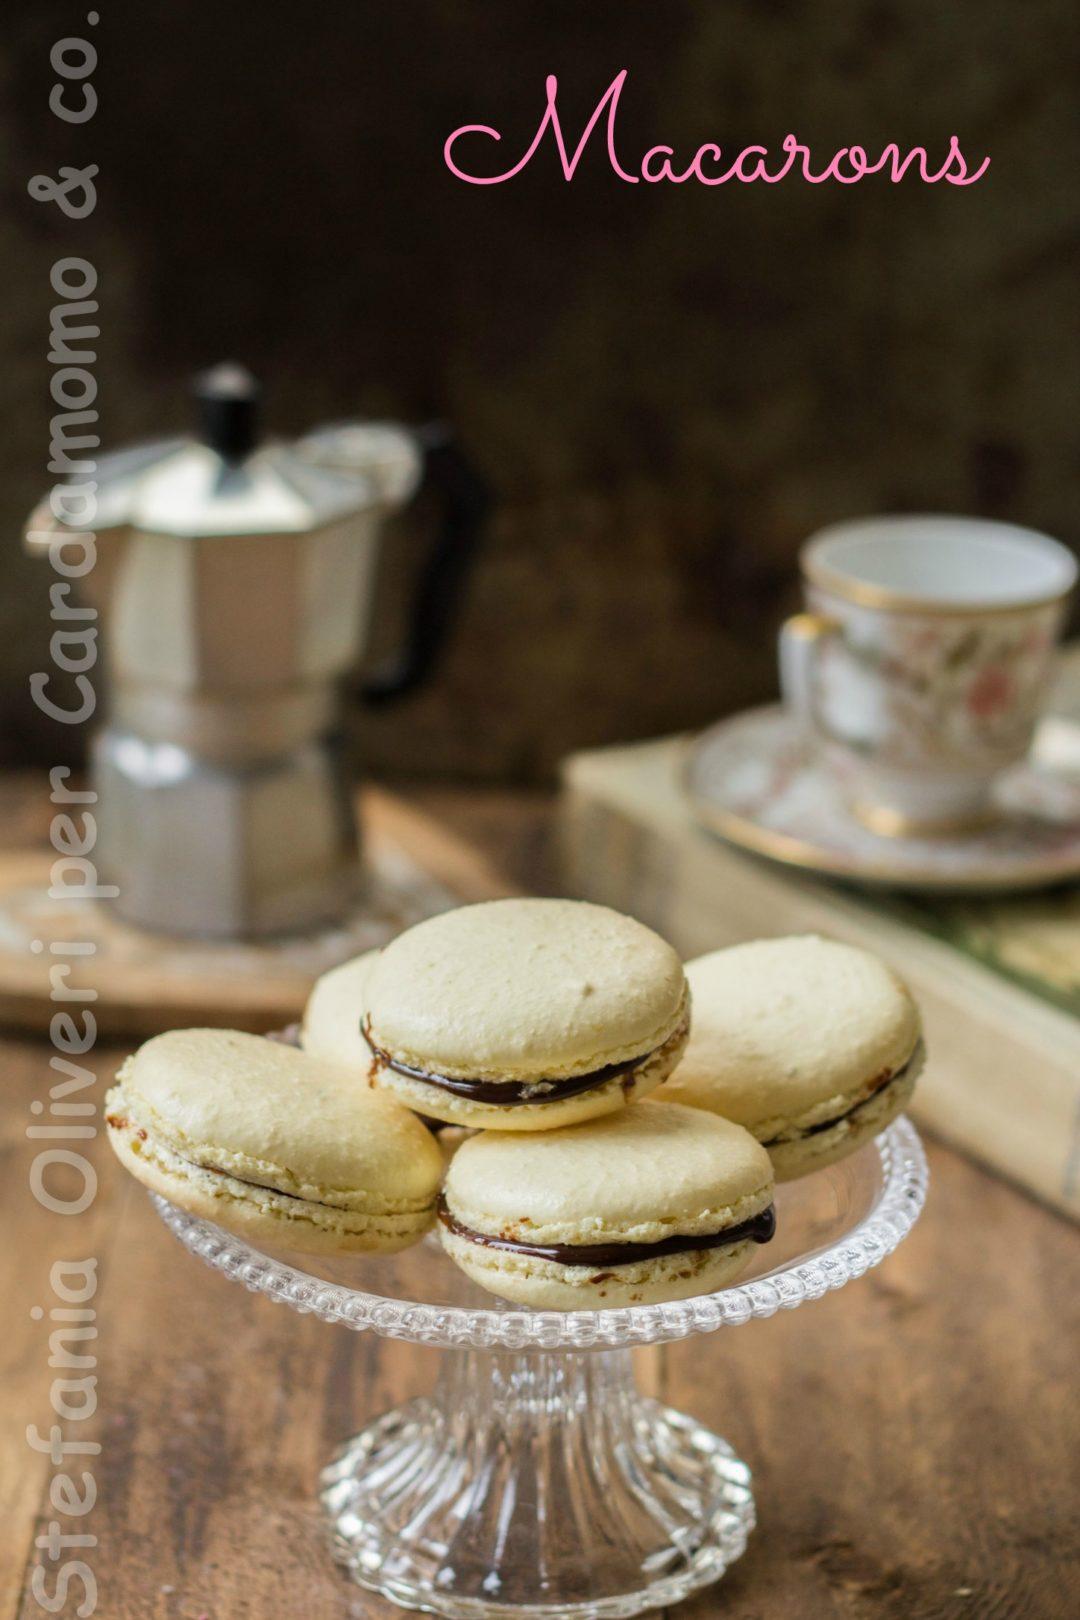 Macaron cioccolato al caffè - Cardamomo & co